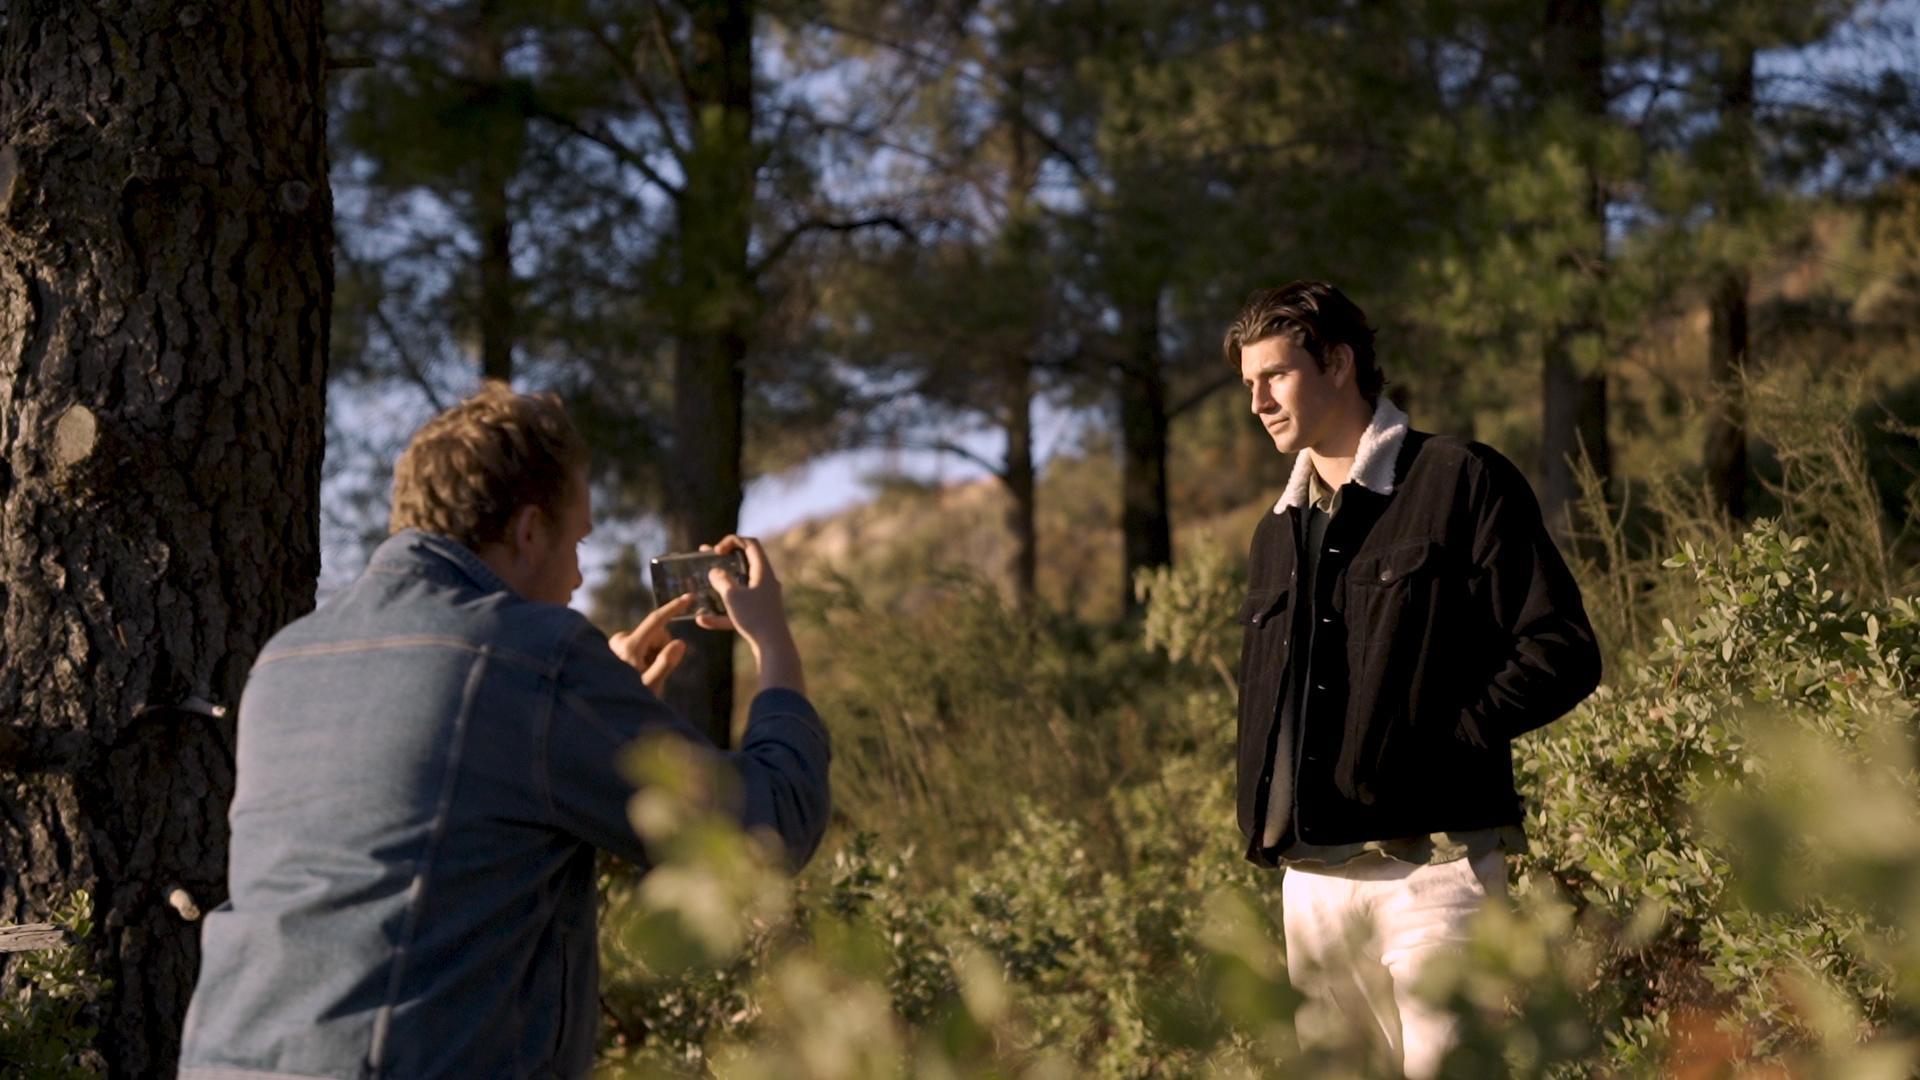 6 Shooting Portraits 00 02 52 13 Still001